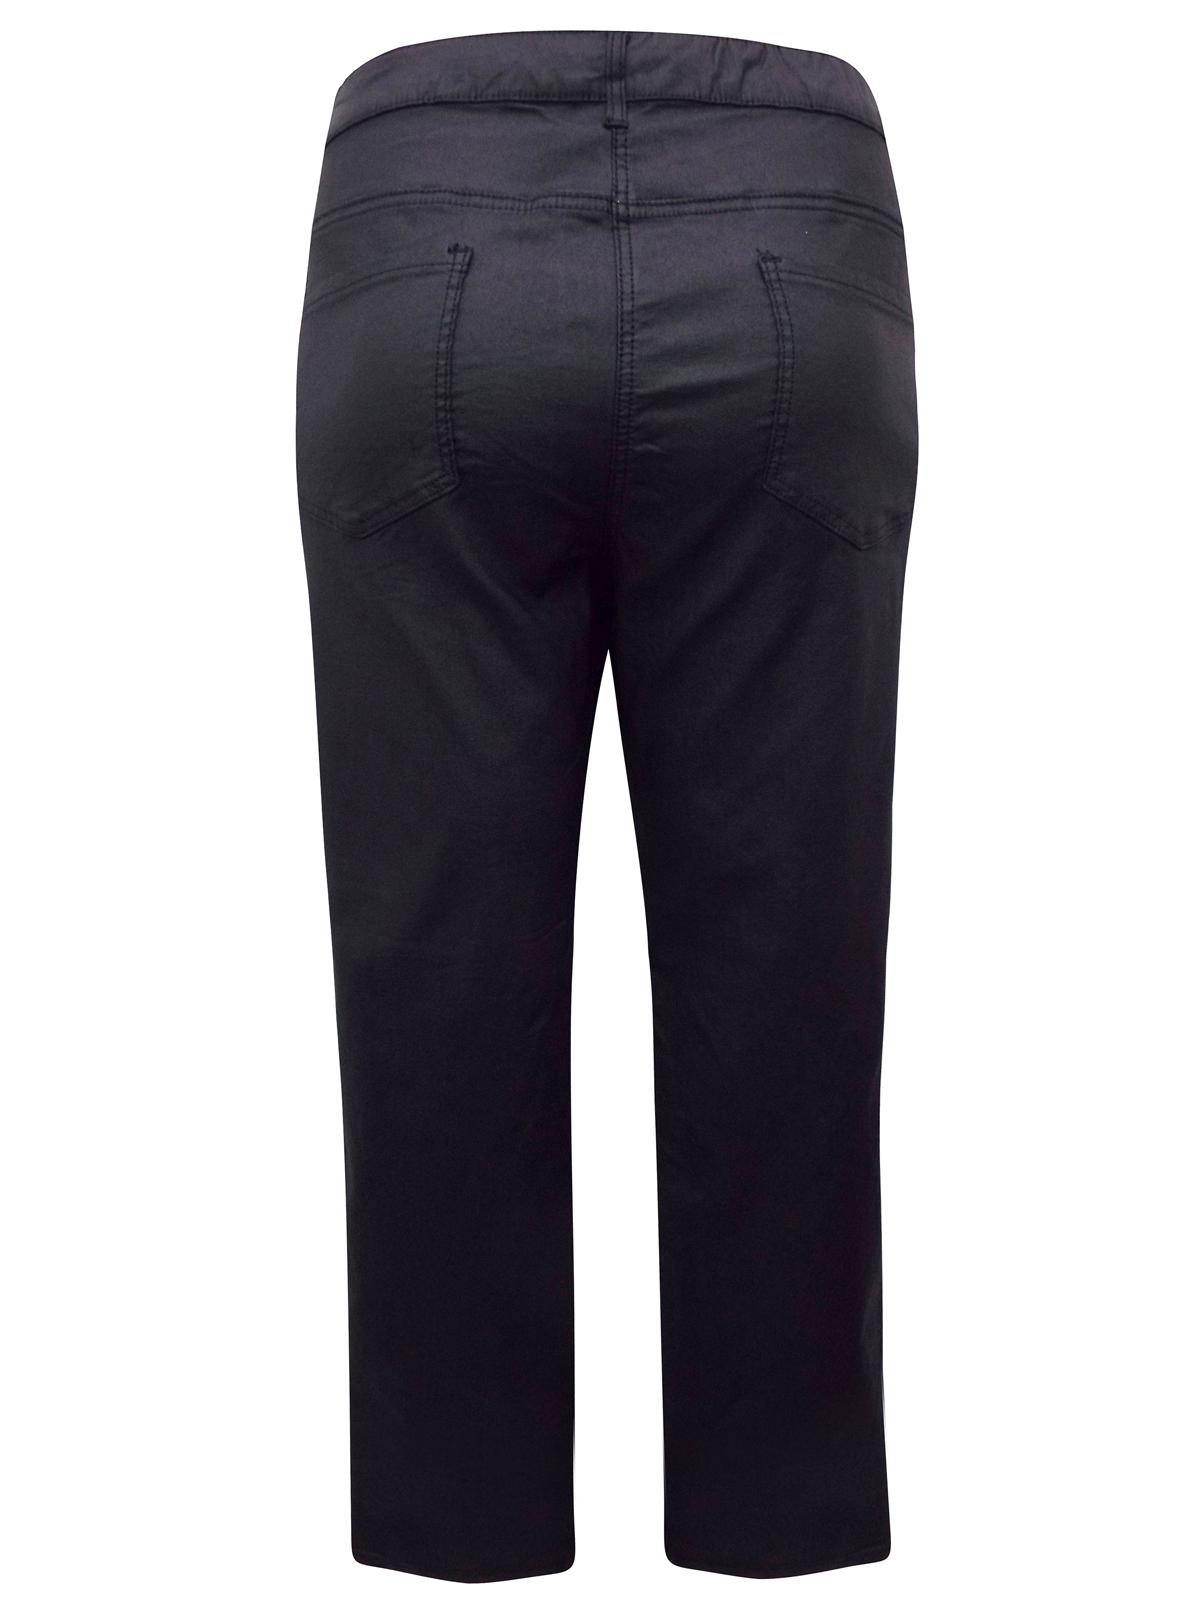 9608c26f9f88e Emoi En Plus - - BLACK Straight Leg Coated Trousers - Size 22 to 30 (EU 50  to 58)